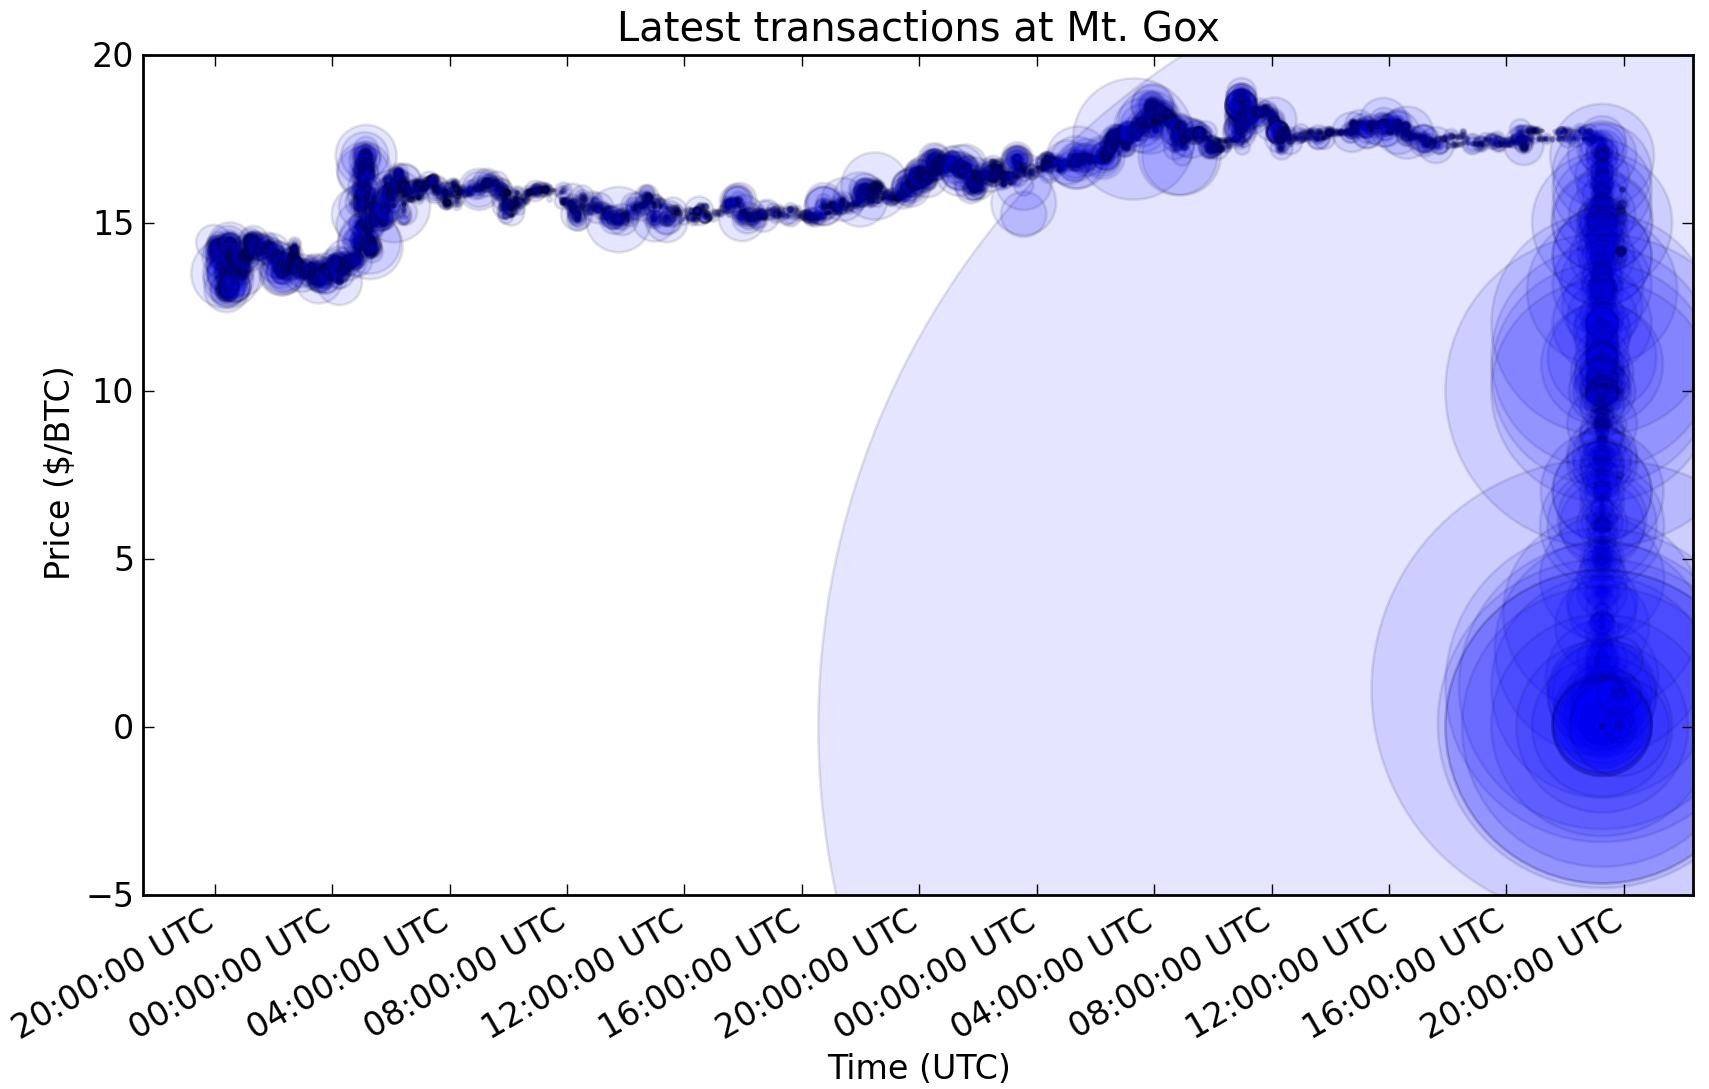 Bitcoin and Ethereum Price Forecast - BTC Prices Crash Further